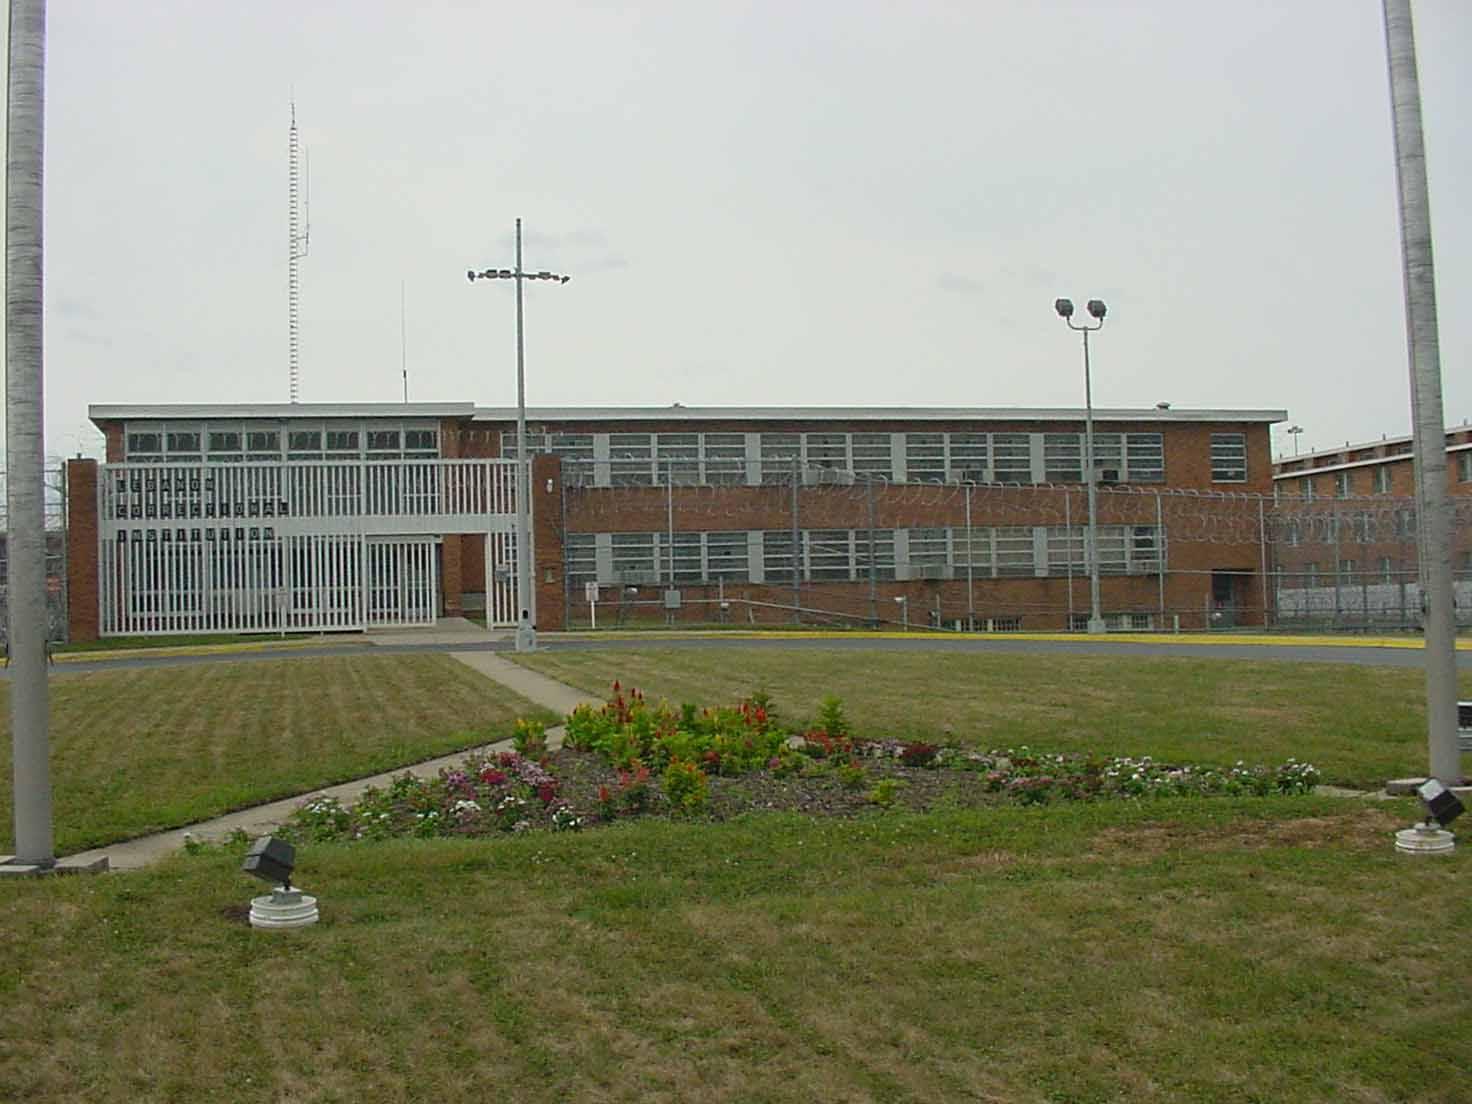 Lebanon prison, Ohio